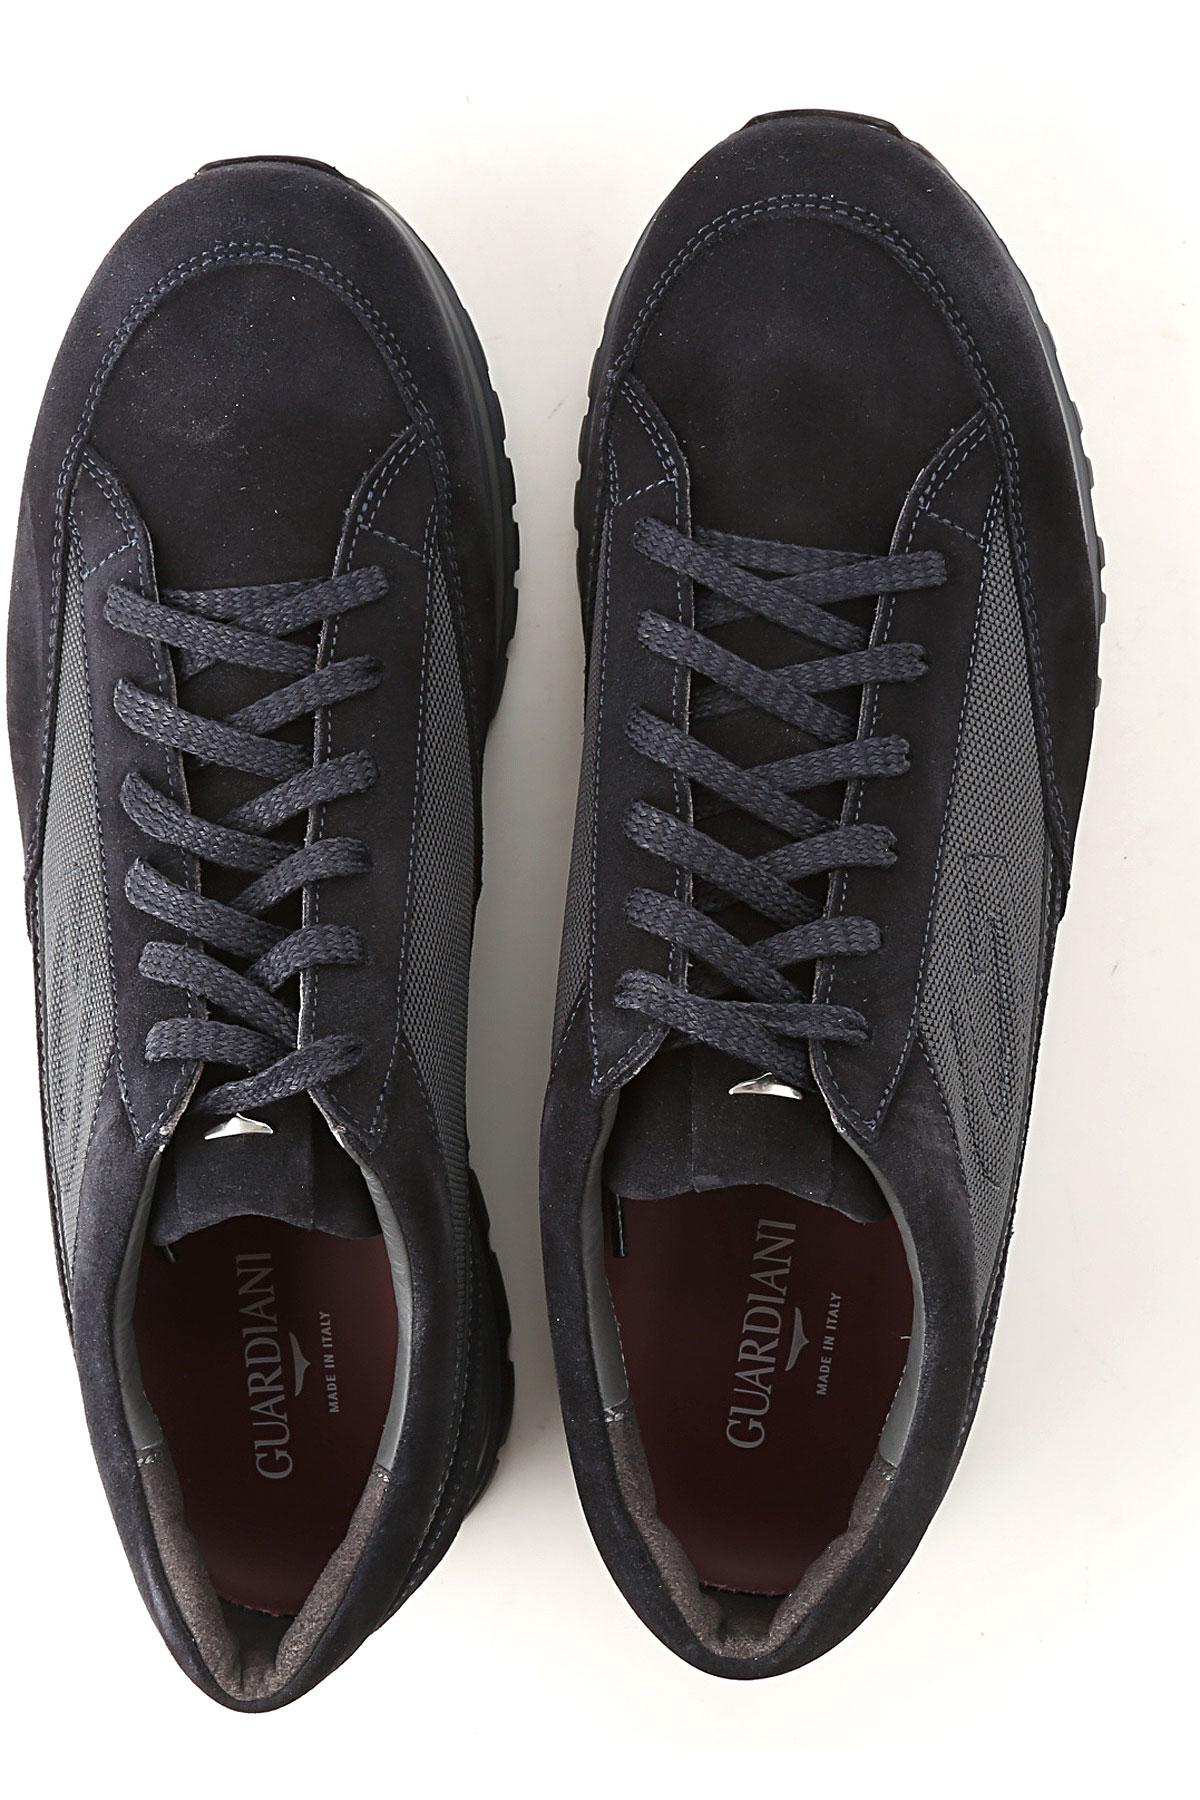 Scarpe Uomo Sneakers Alberto Guardiani Offerte Limitate